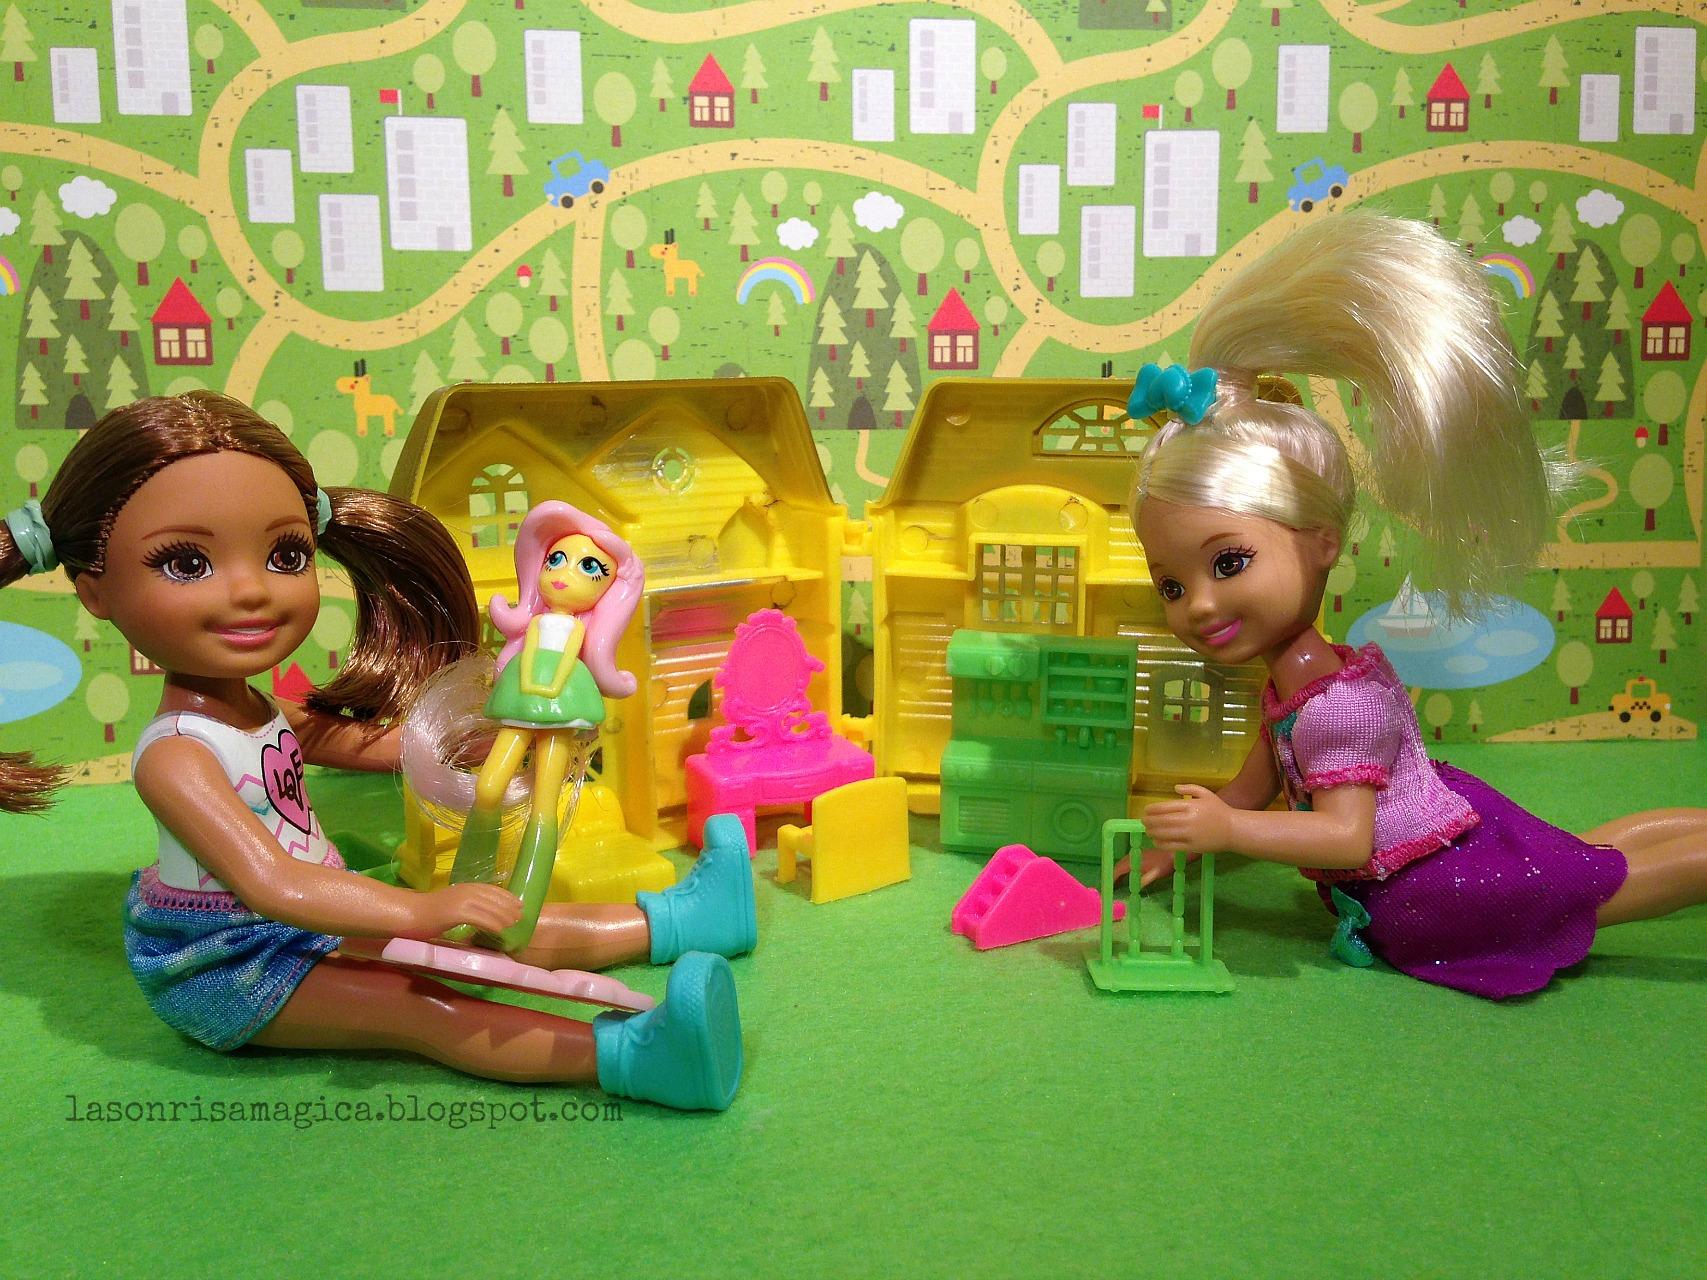 La Sonrisa Mágica: A dollhouse for Chelsea